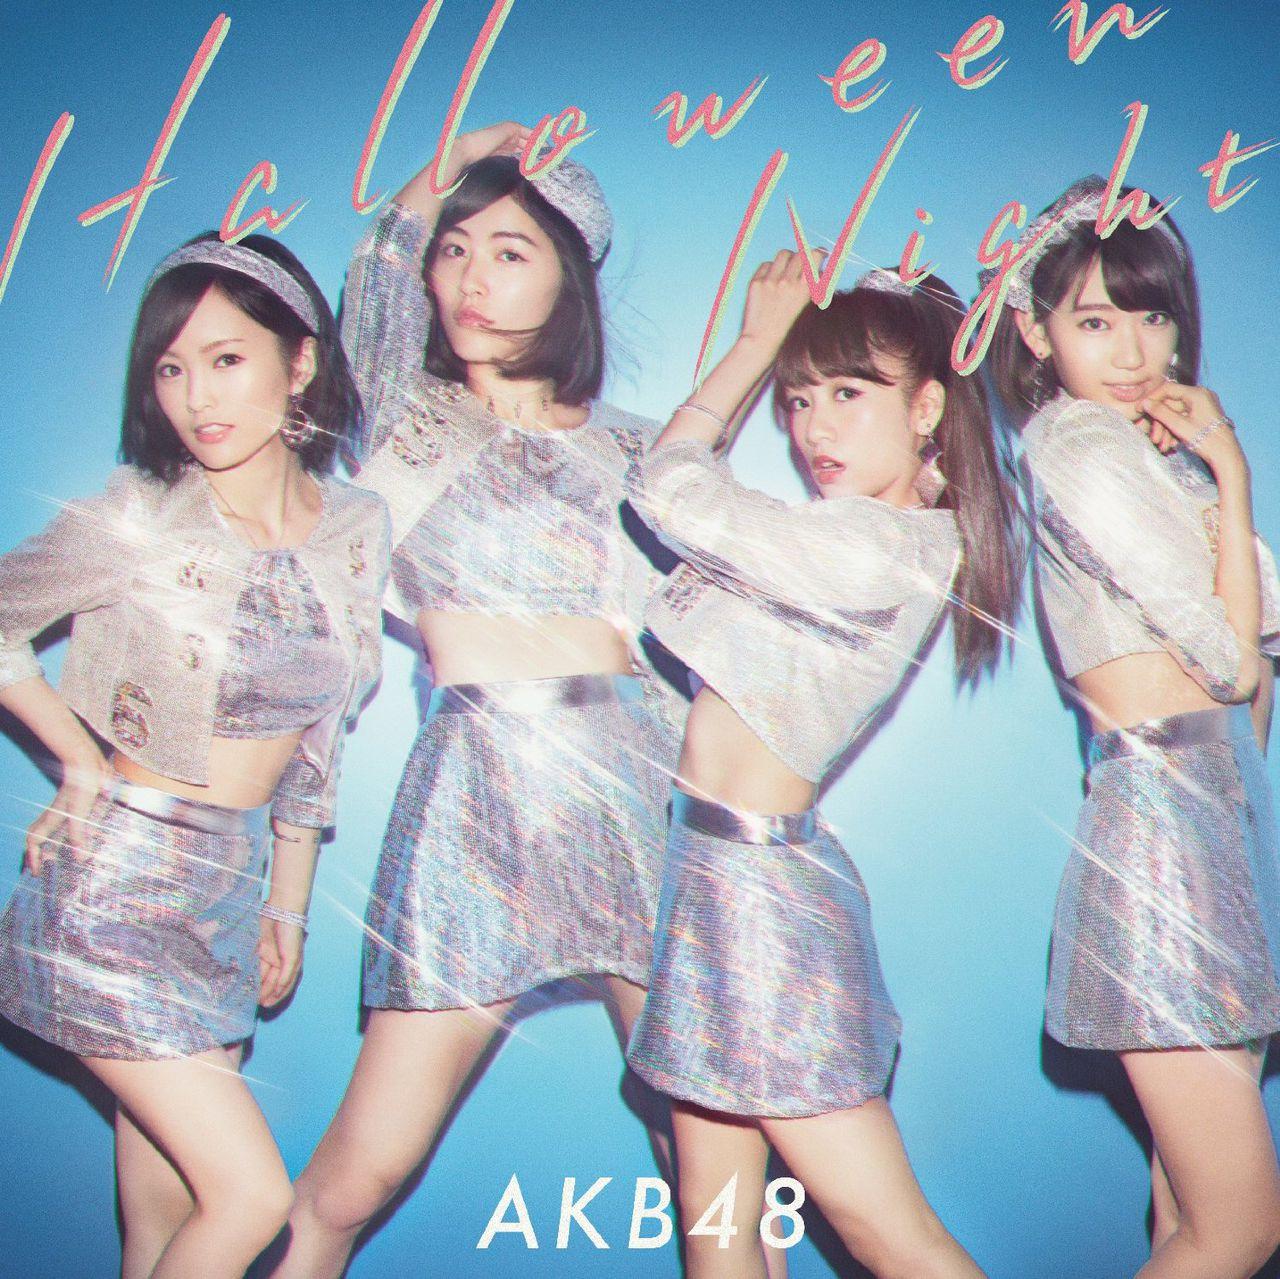 AKB48の画像 p1_15